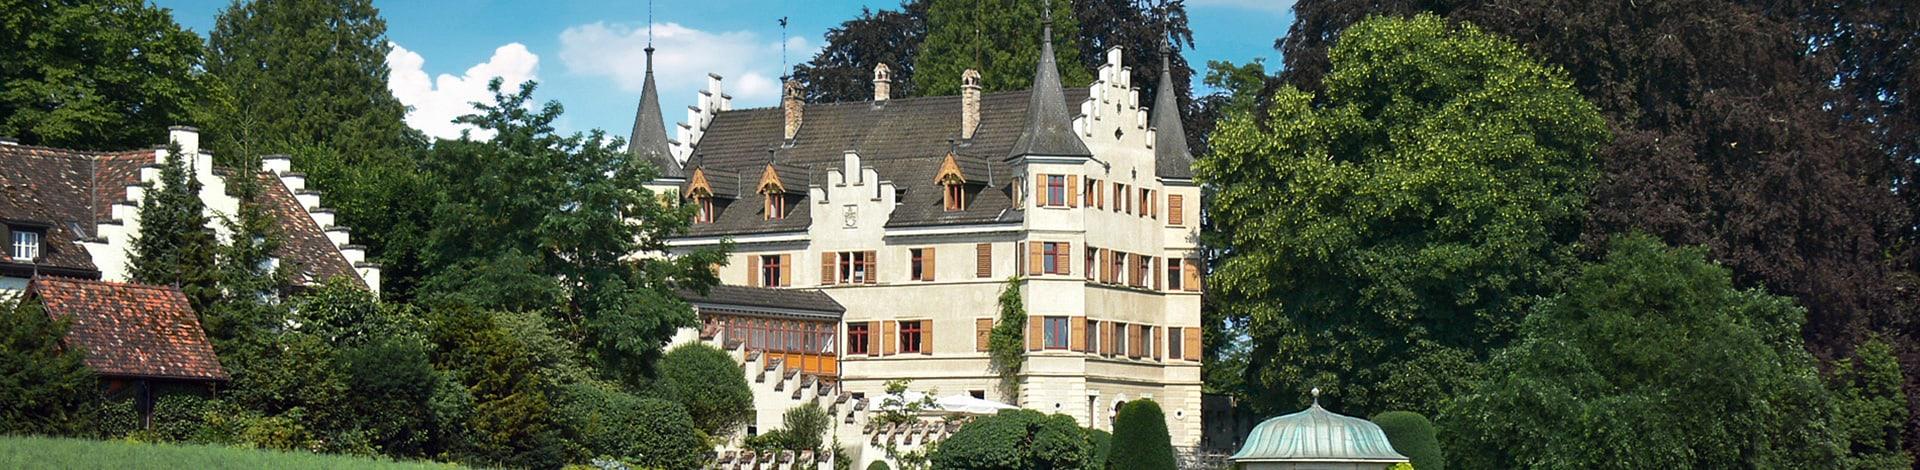 Schloss in Kreuzlingen